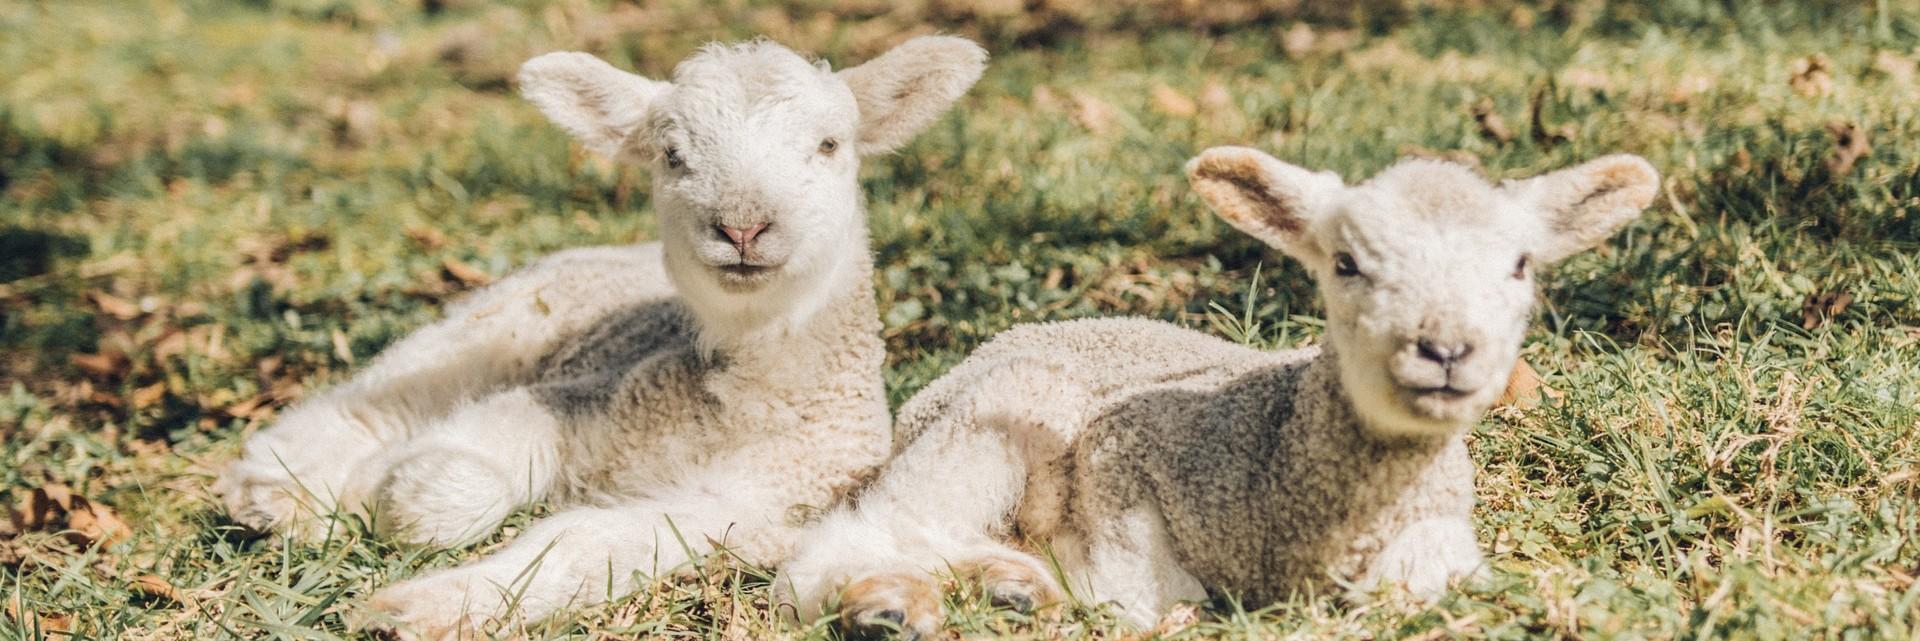 Australian merino lambs